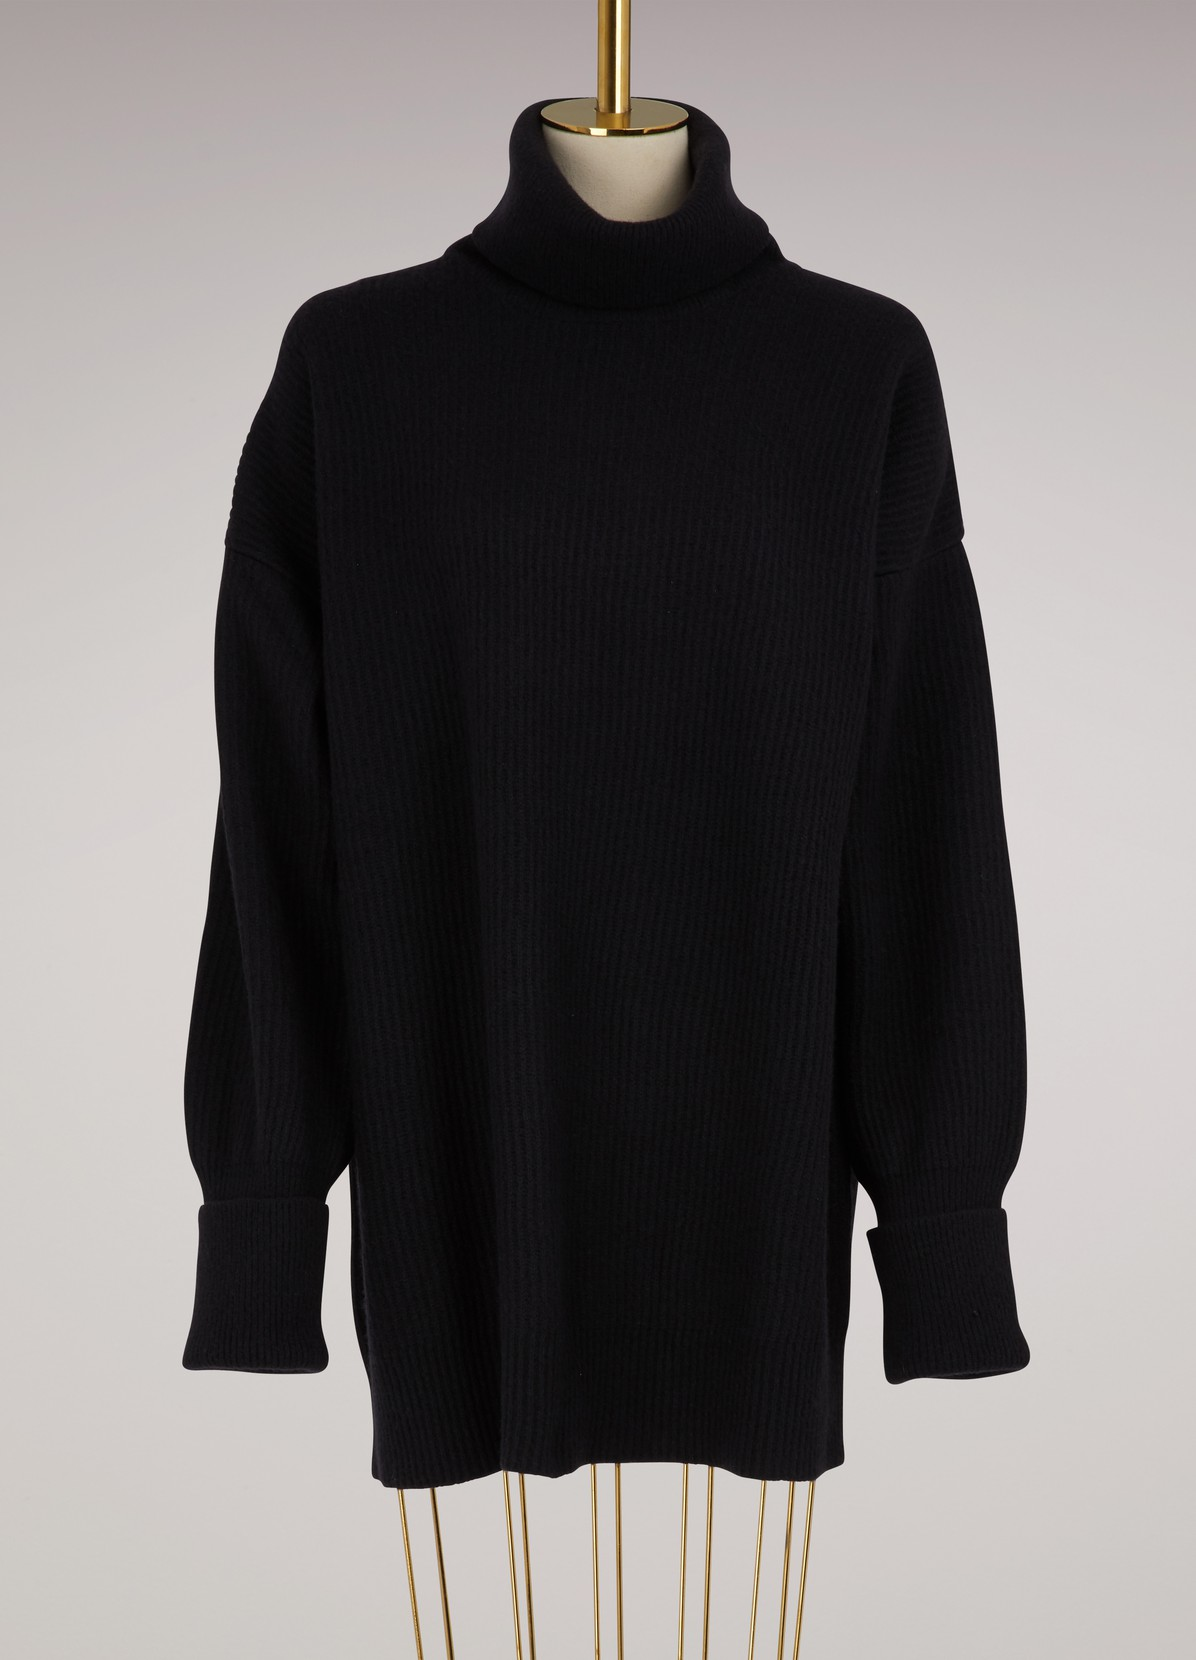 Oversize wool sweater | MAISON MARGIELA | 24 Sèvres